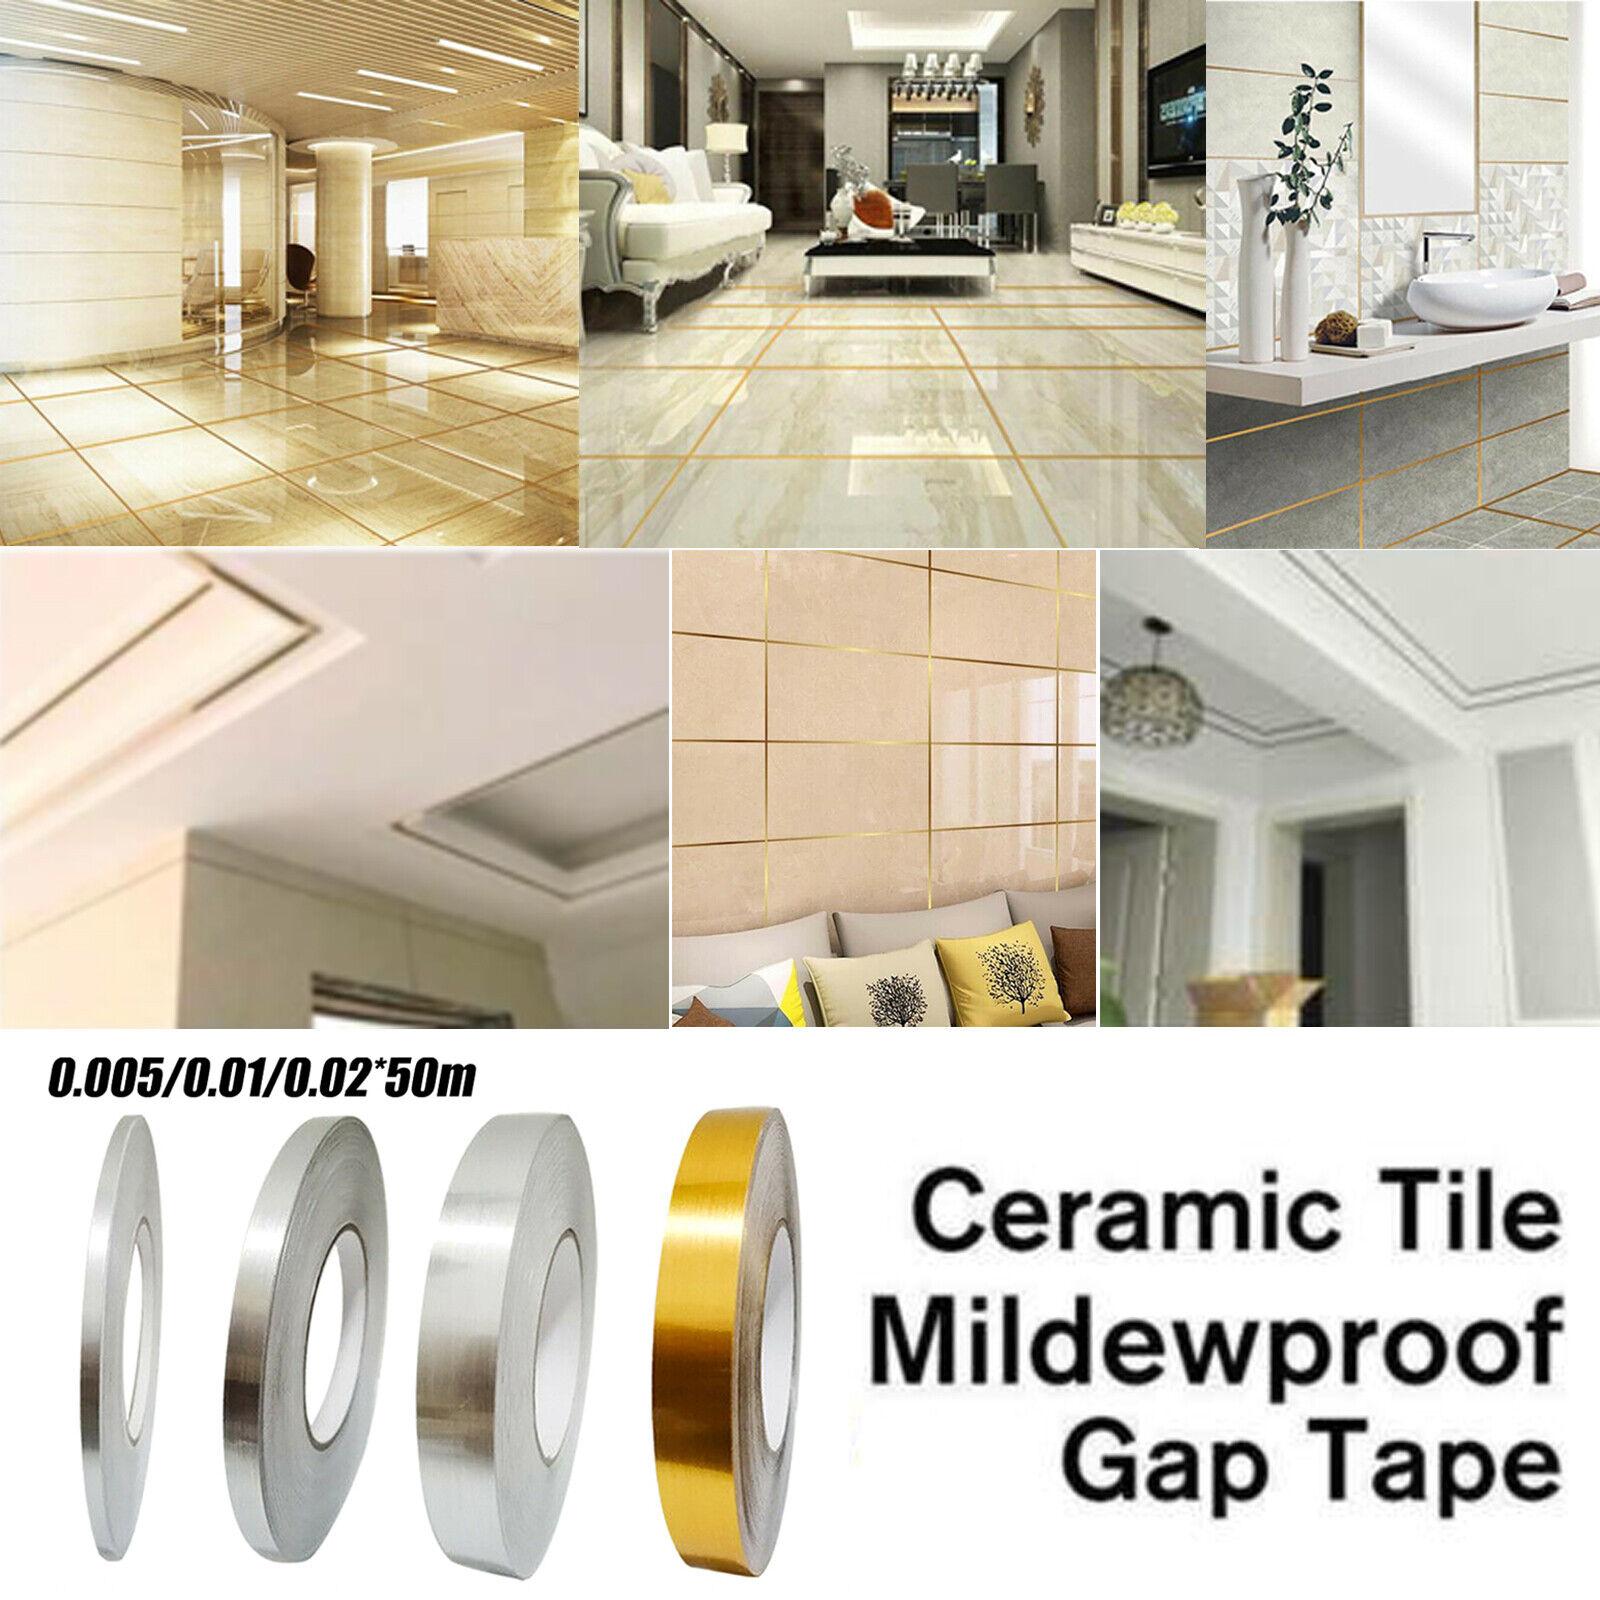 Ceramic Tile Mildewproof Gap Tape Self-adhesive Kitchen Seam Sticker Mildew